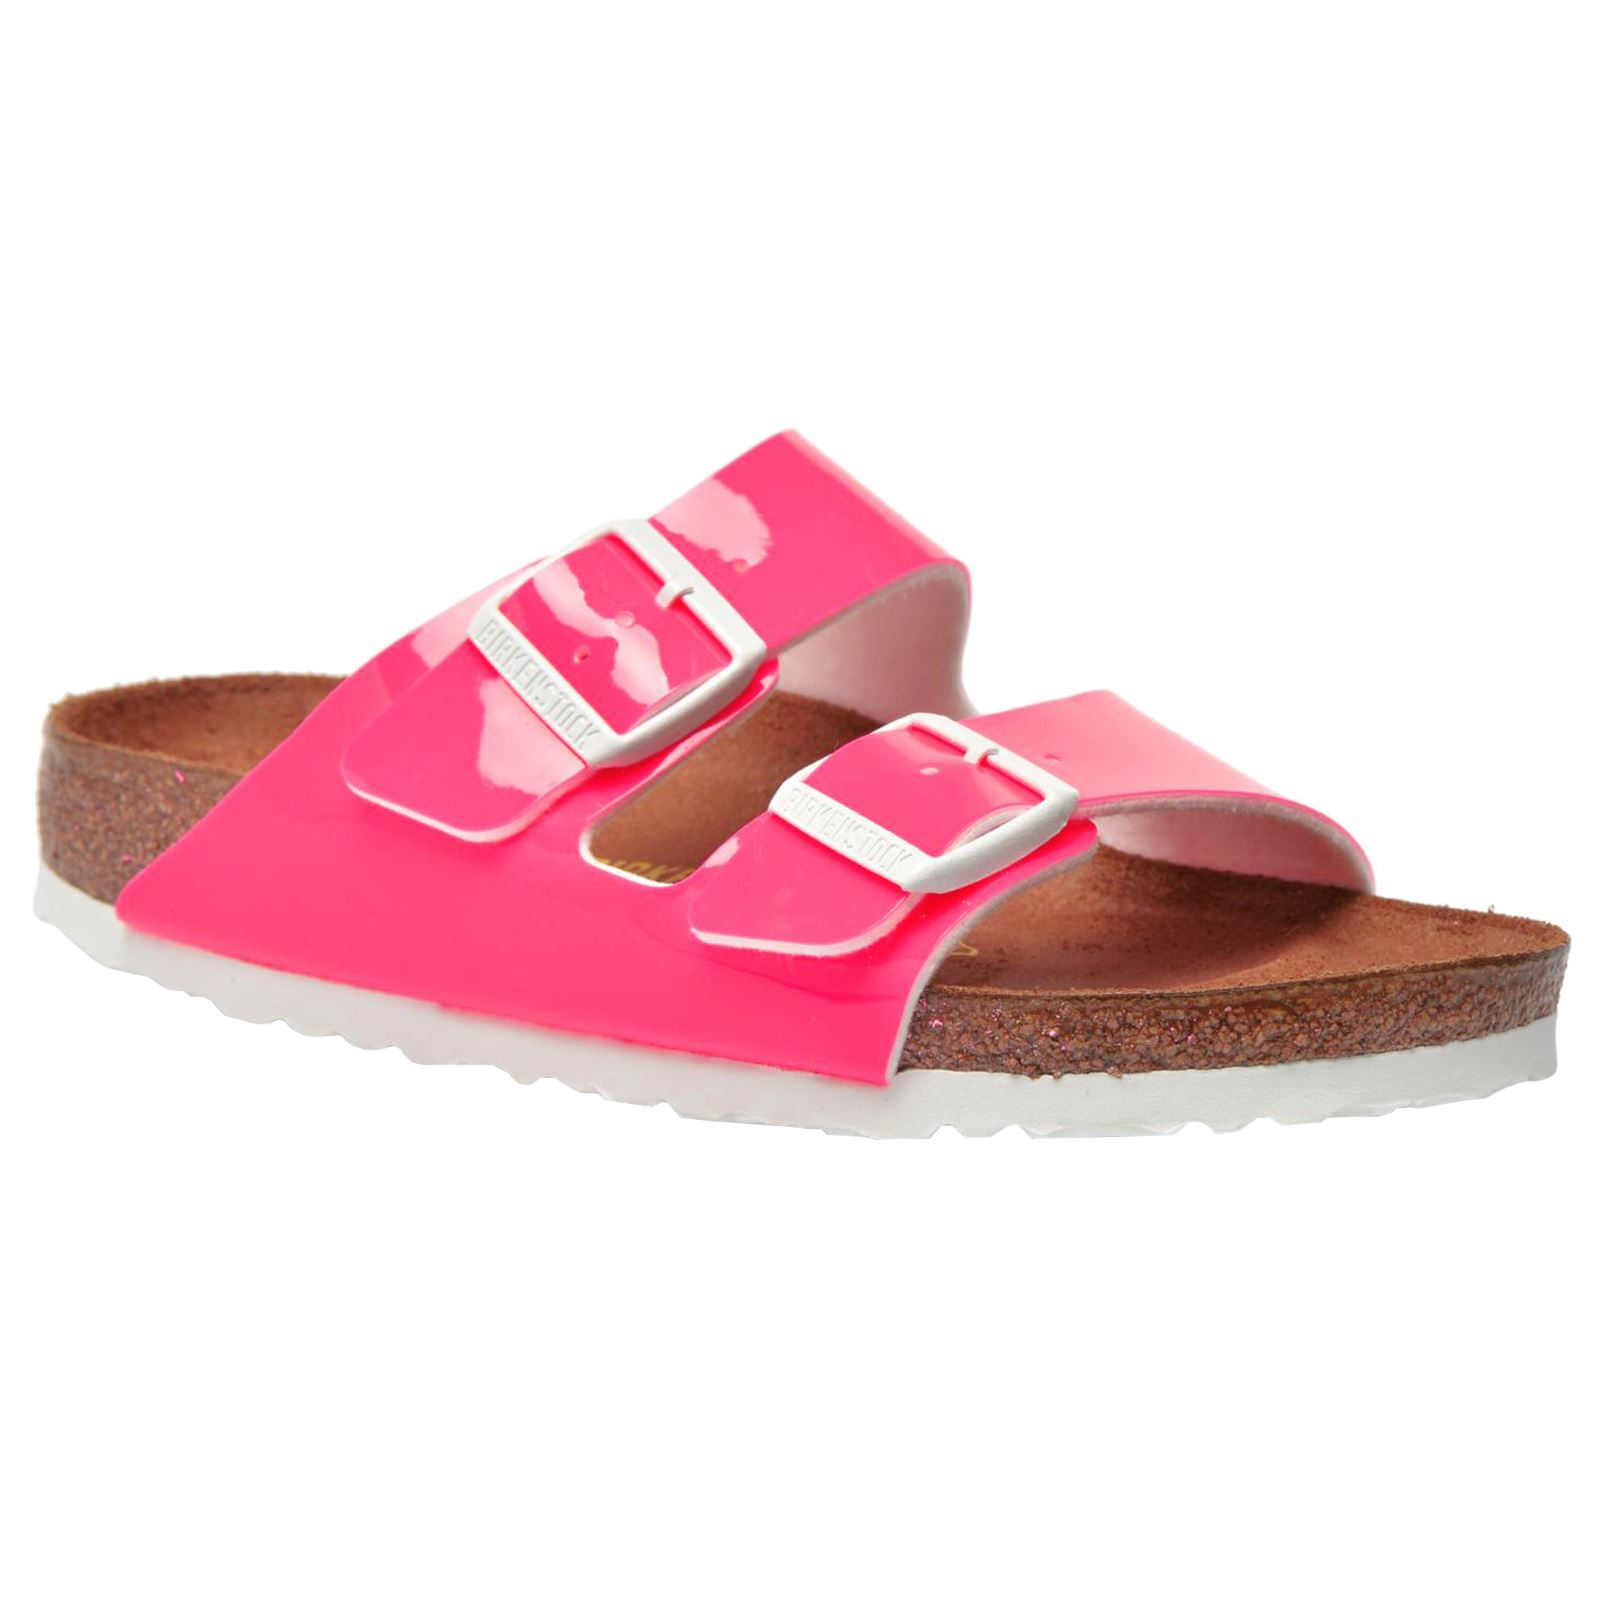 26d3f082e4b60a Birkenstock Arizona Patent Neon Pink Womens Birko-Flor Twin Strap Slide  Sandals